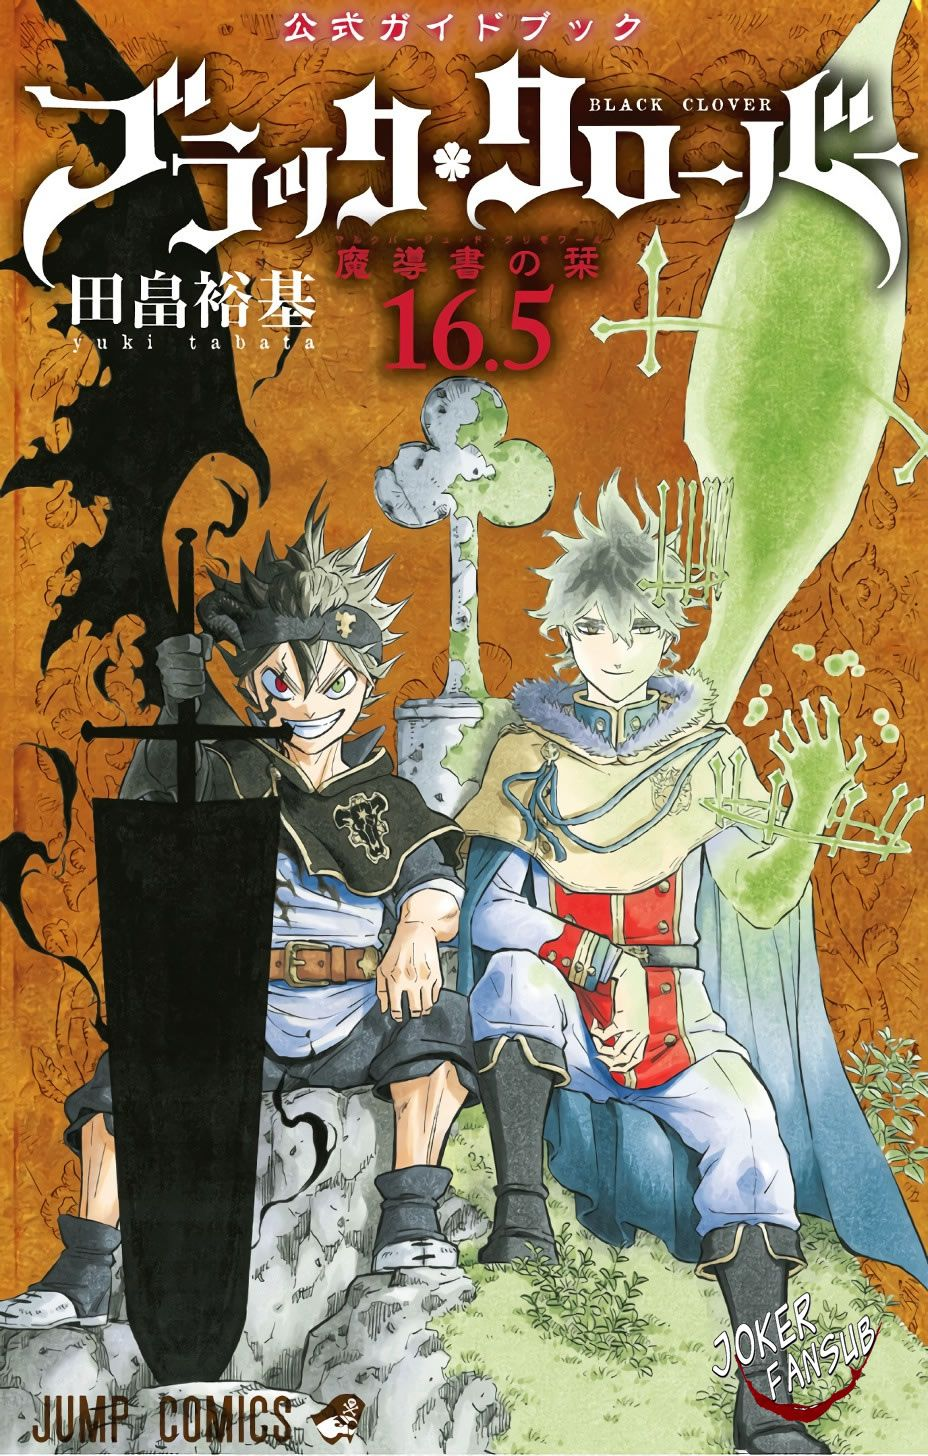 Undefined Black Clover Manga Black Clover Anime Black